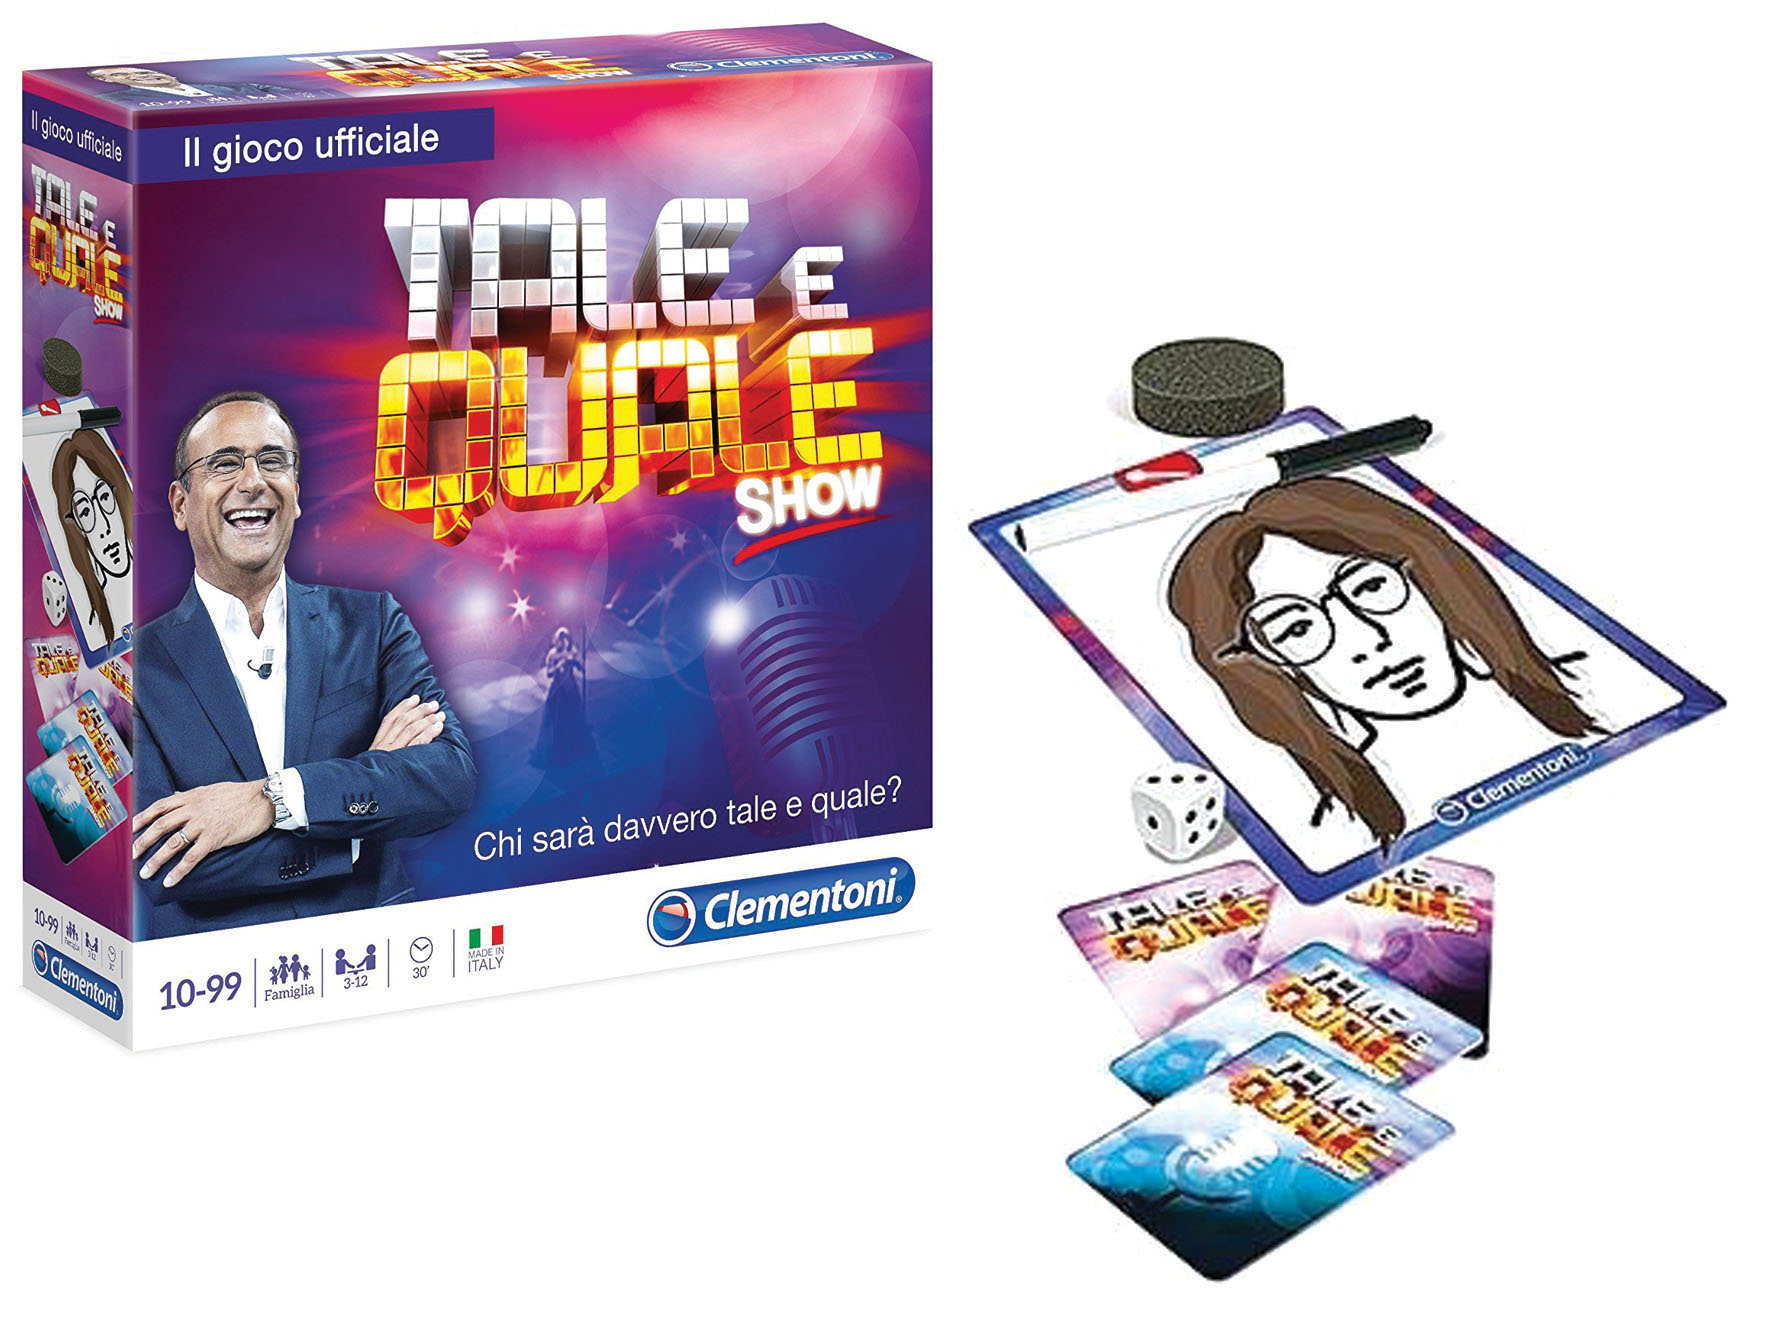 TALE E QUALE SHOW GIOCO